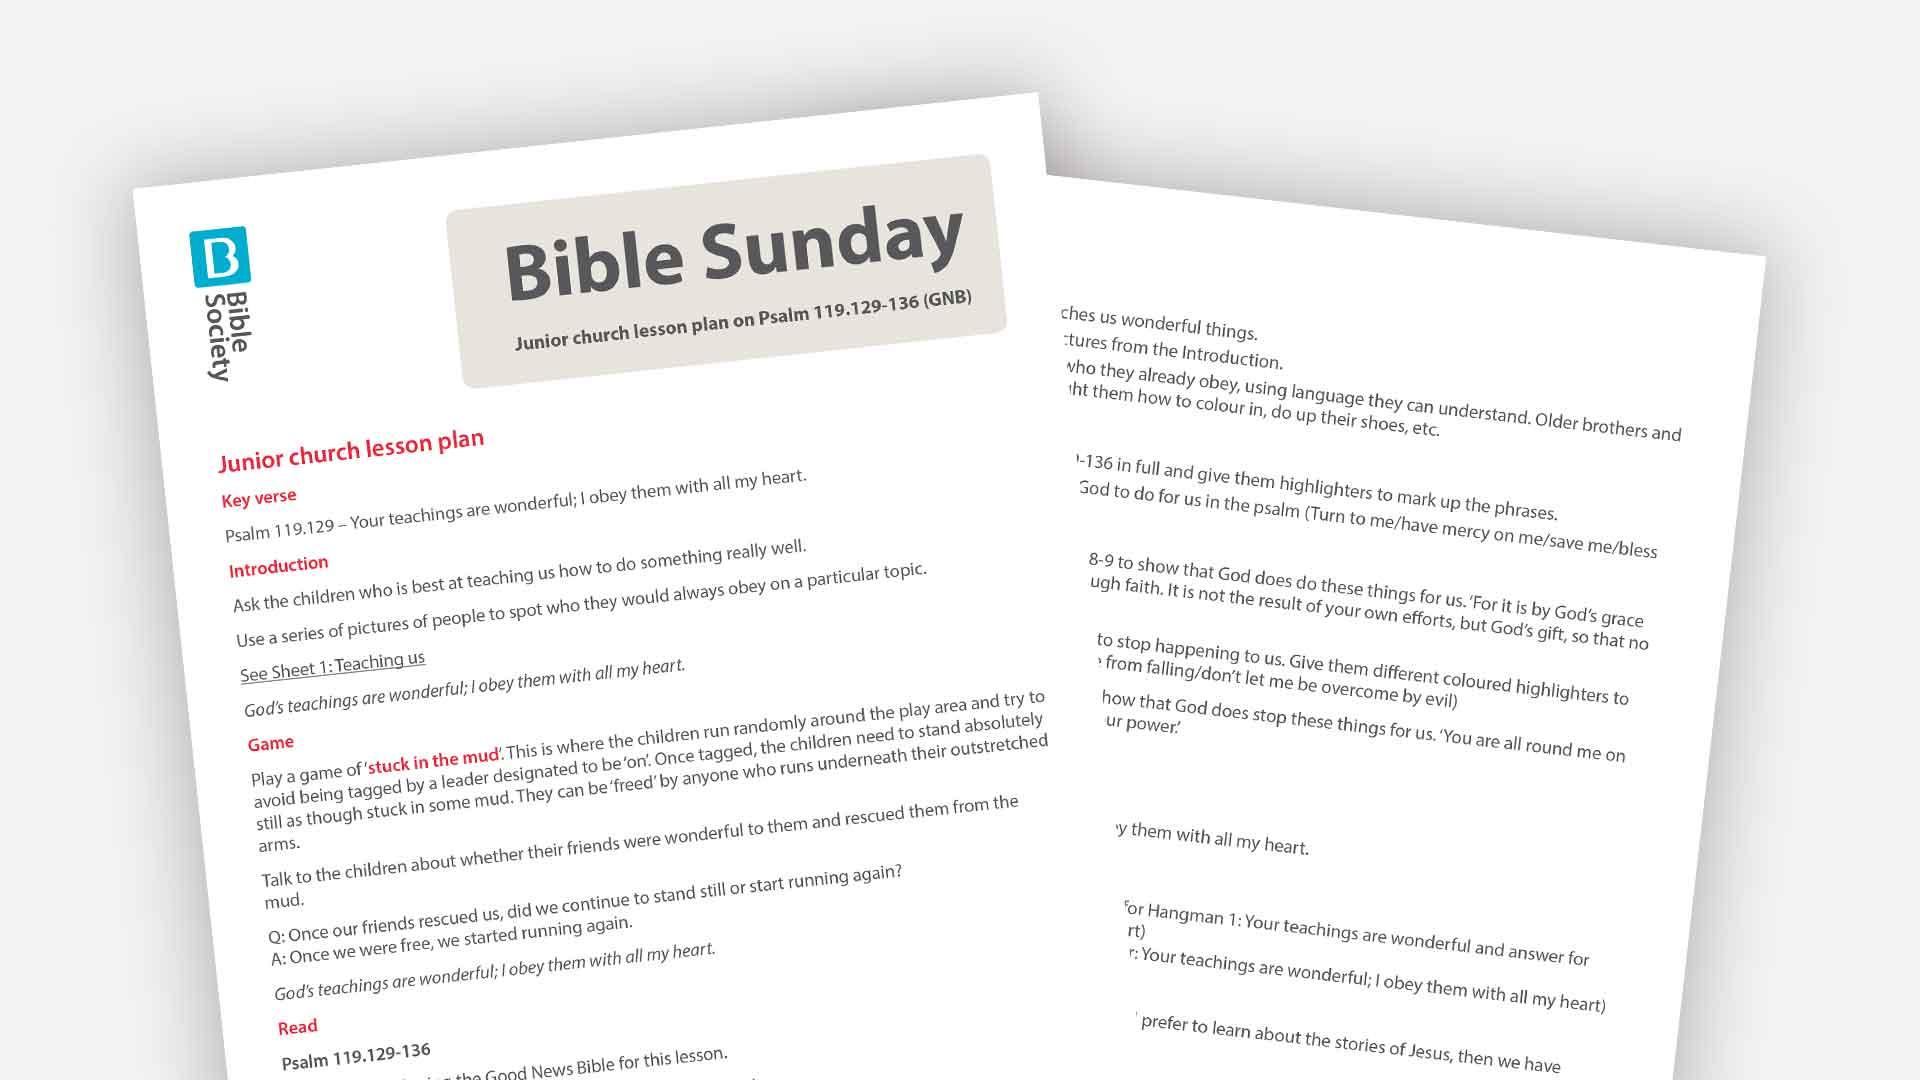 Bible Sunday 2019 - Bible Society